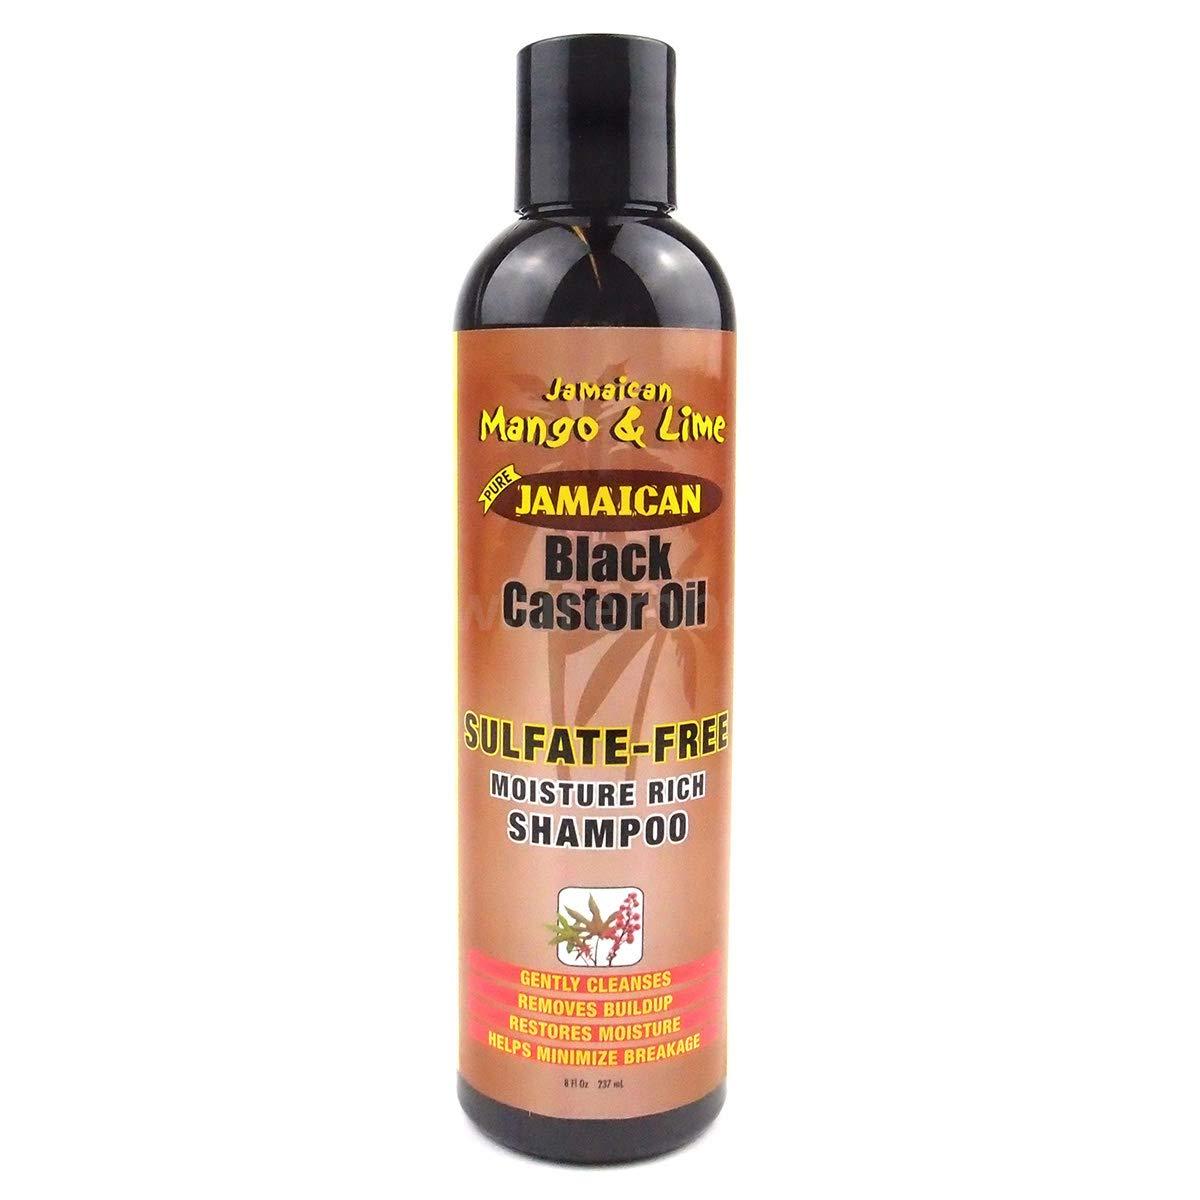 Jamaican Black Castor Oil Sulfate Free Shampoo